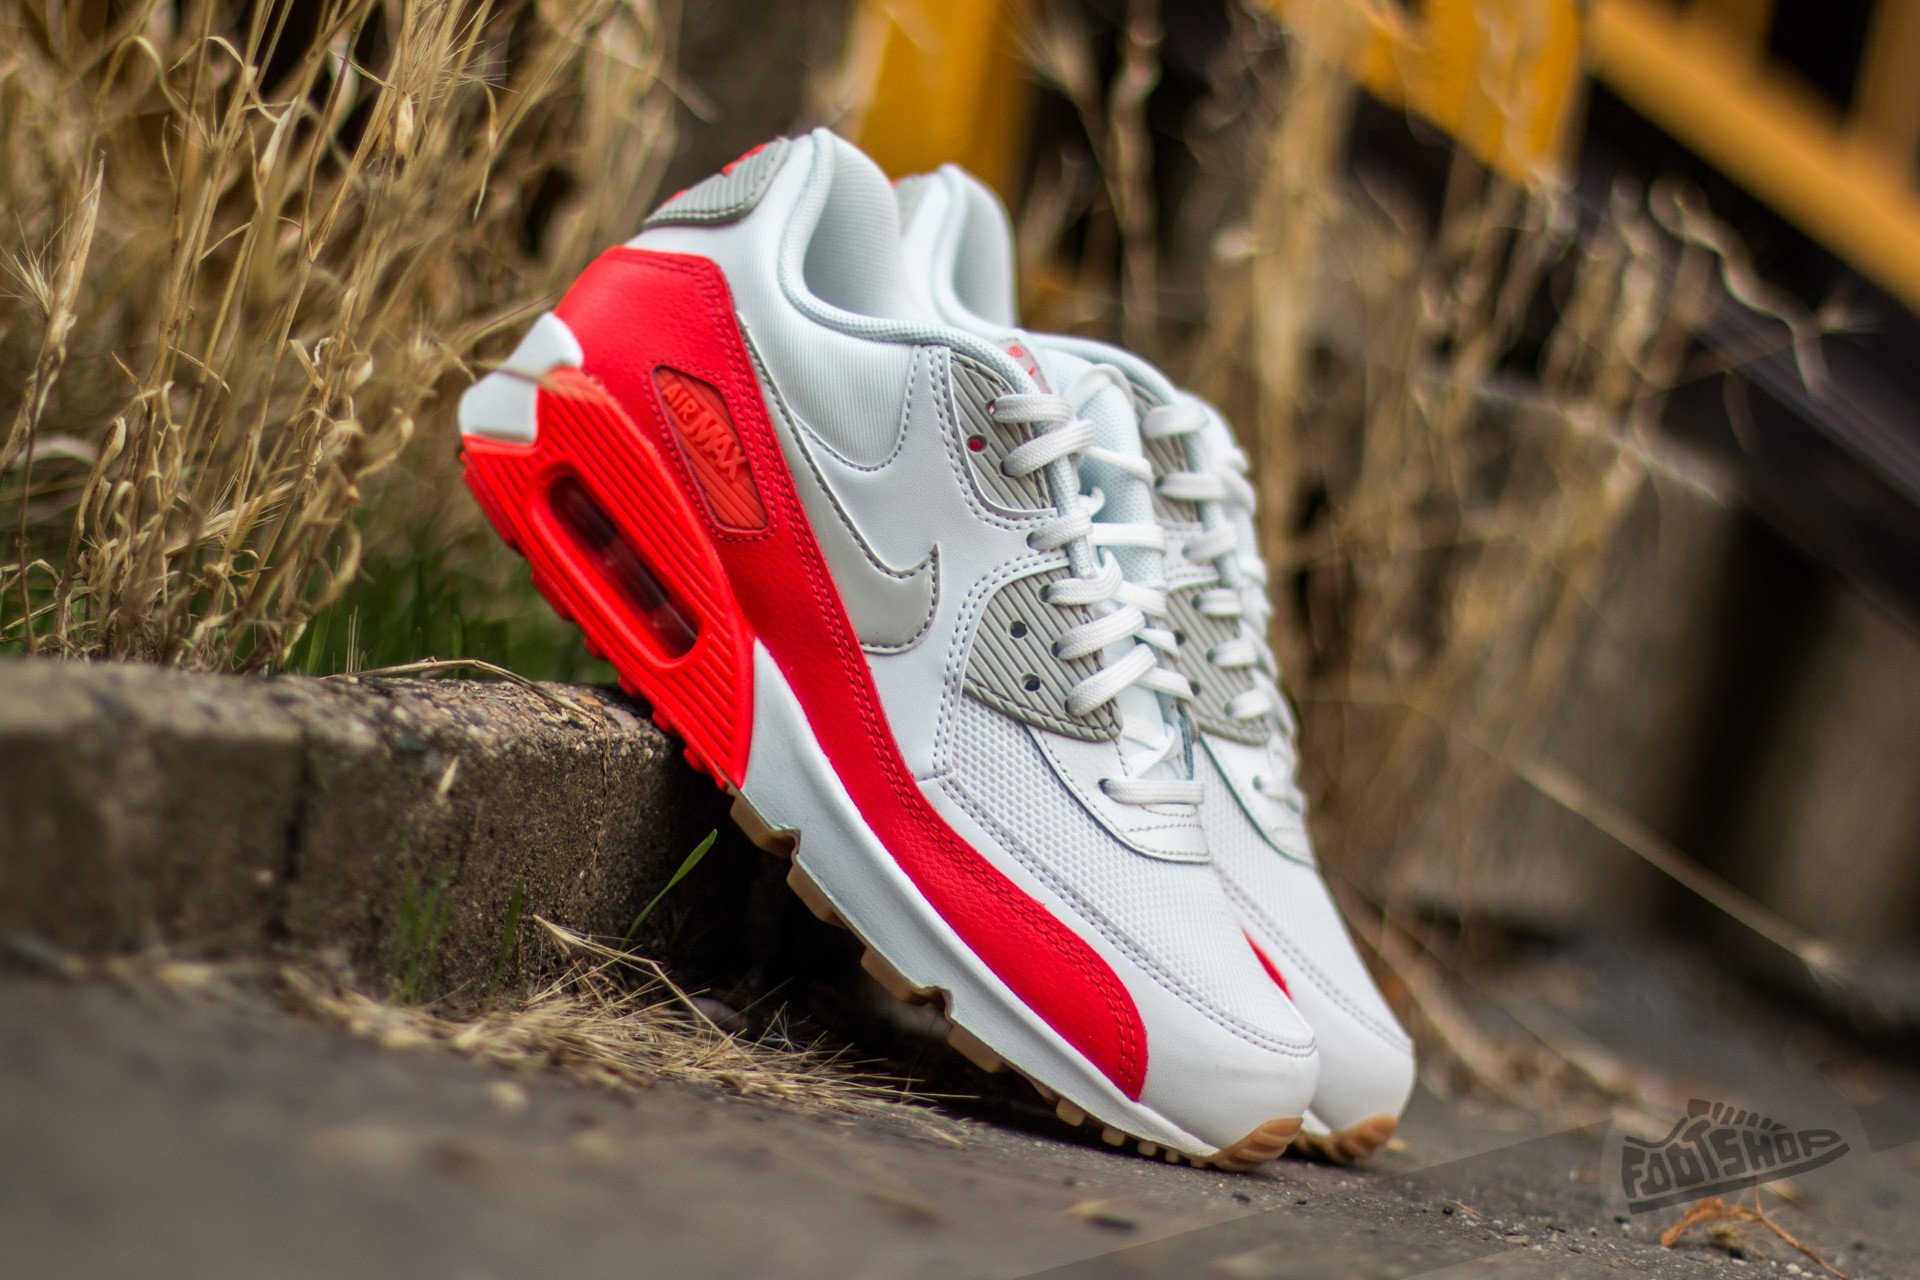 online store e242e a6f13 Nike Wmns Air Max 90 Essential Summit White  Light Bone-Bright Crimson